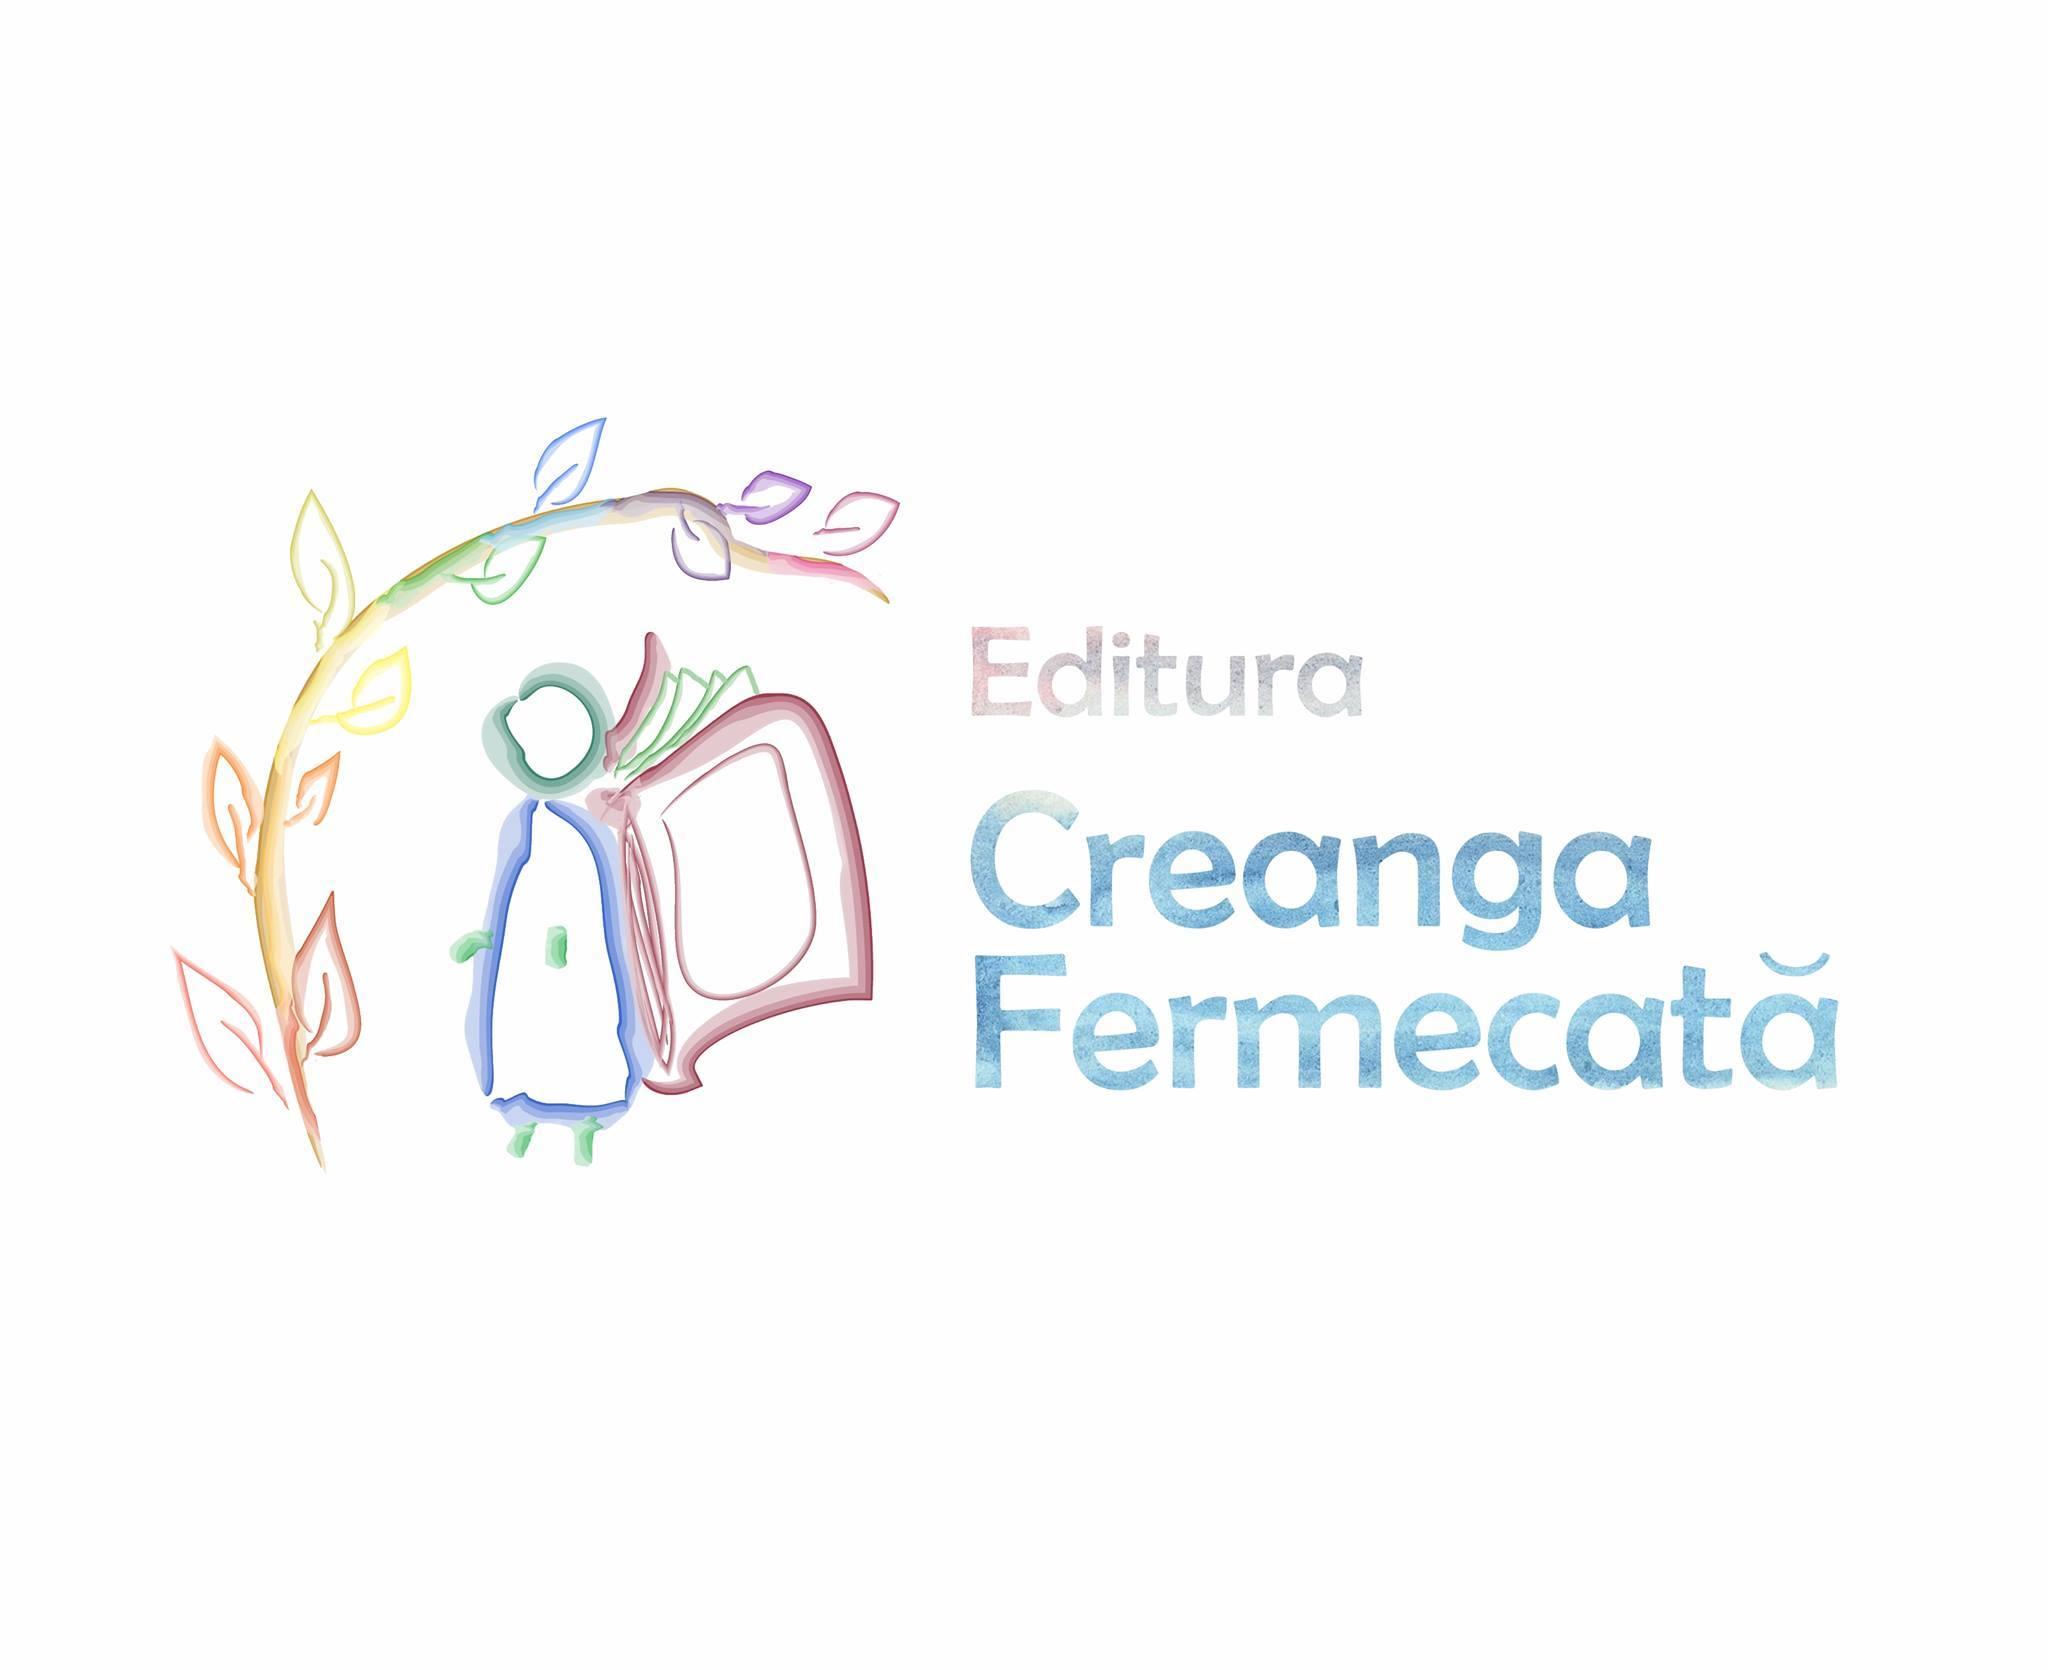 Editura Creanga Fermecata